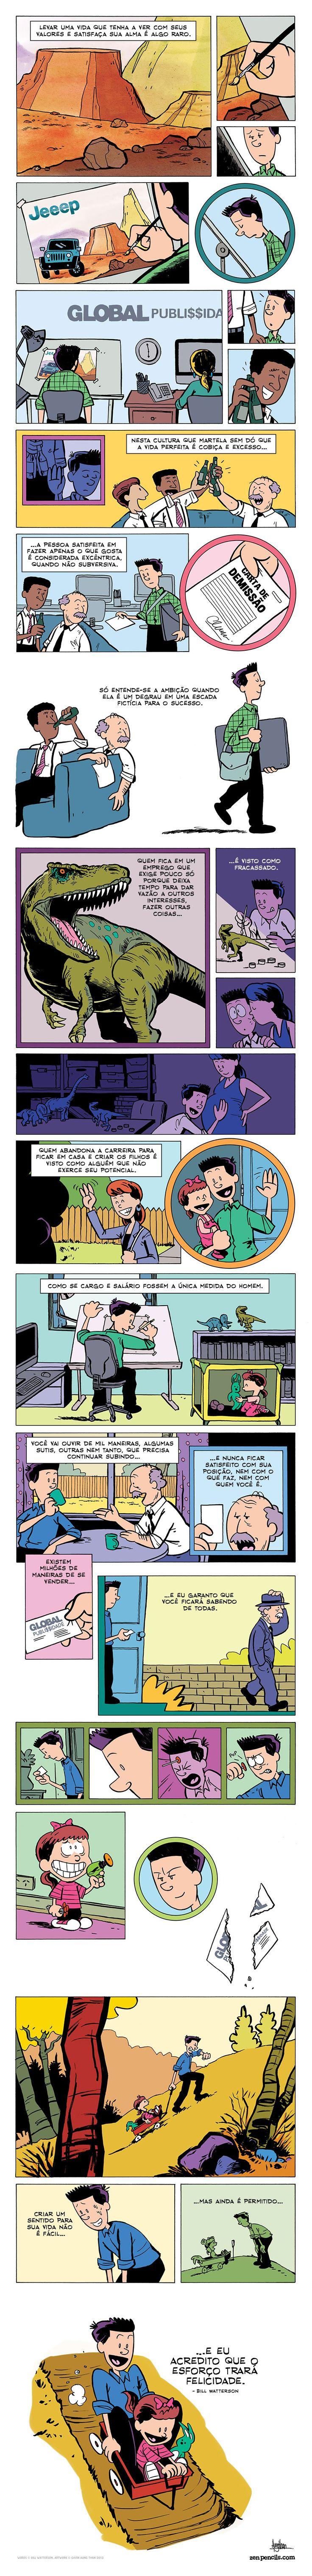 BILL WATTERSON Conselho de um cartunista.jpg